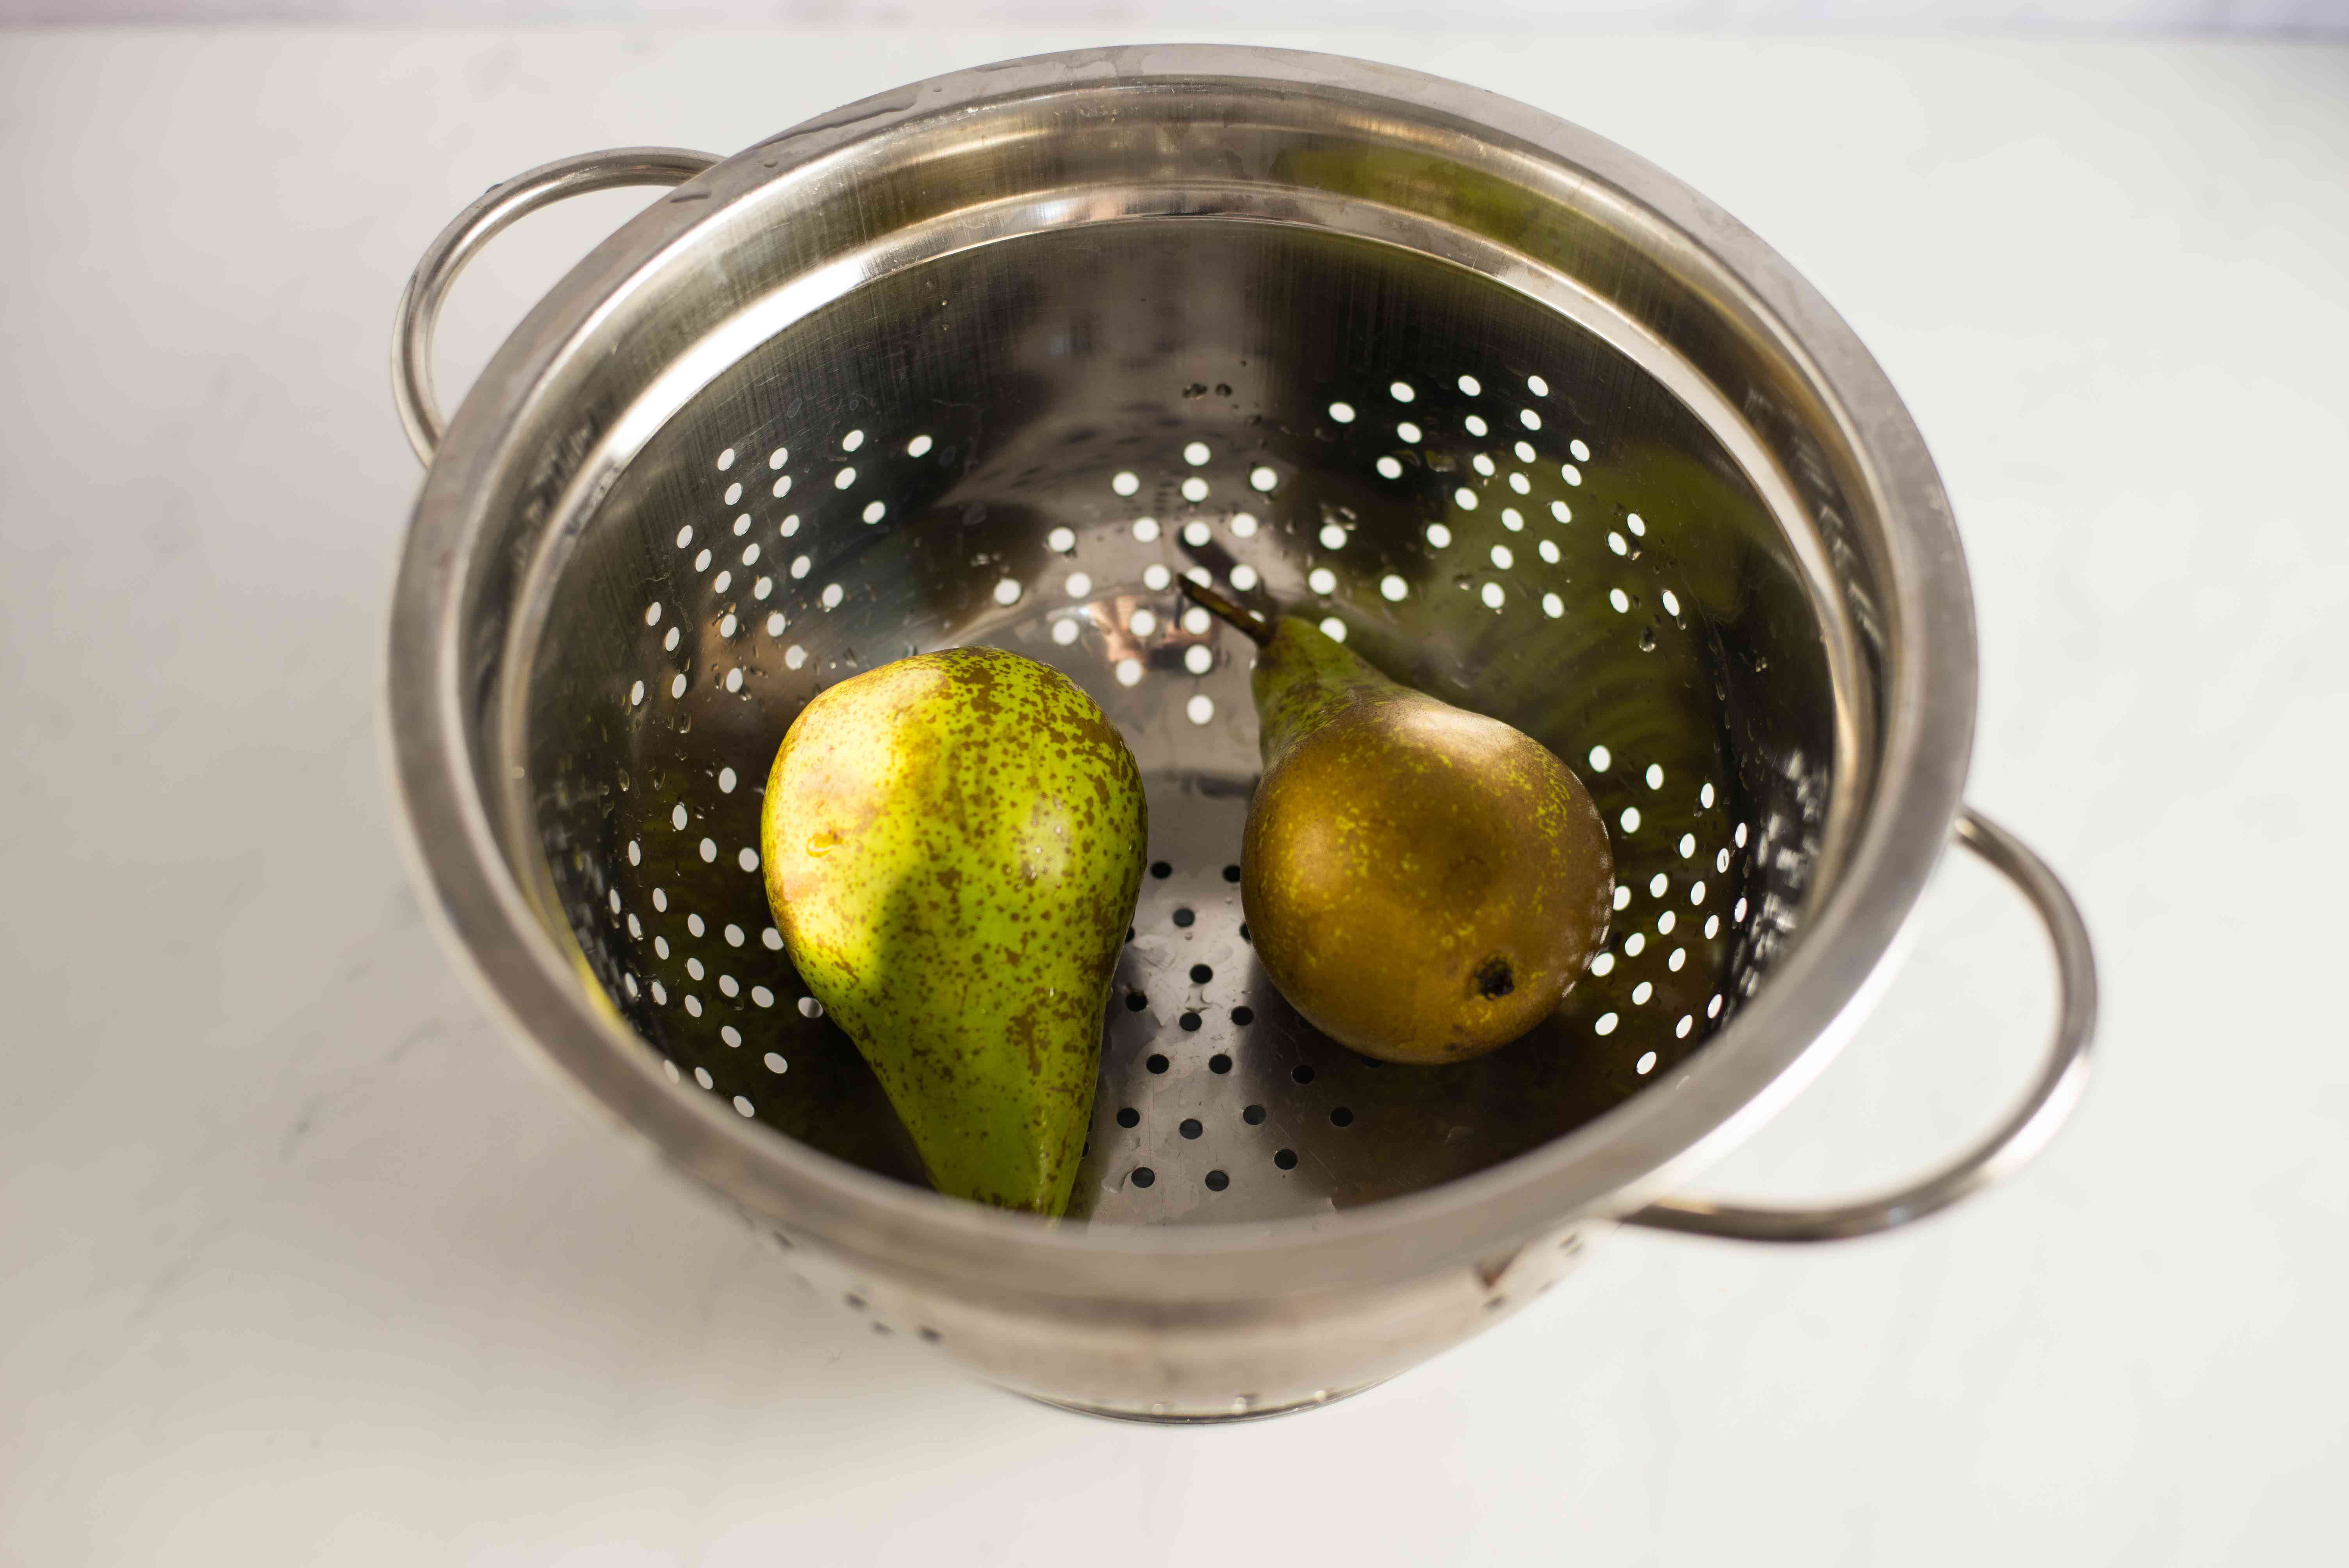 Rinse pears